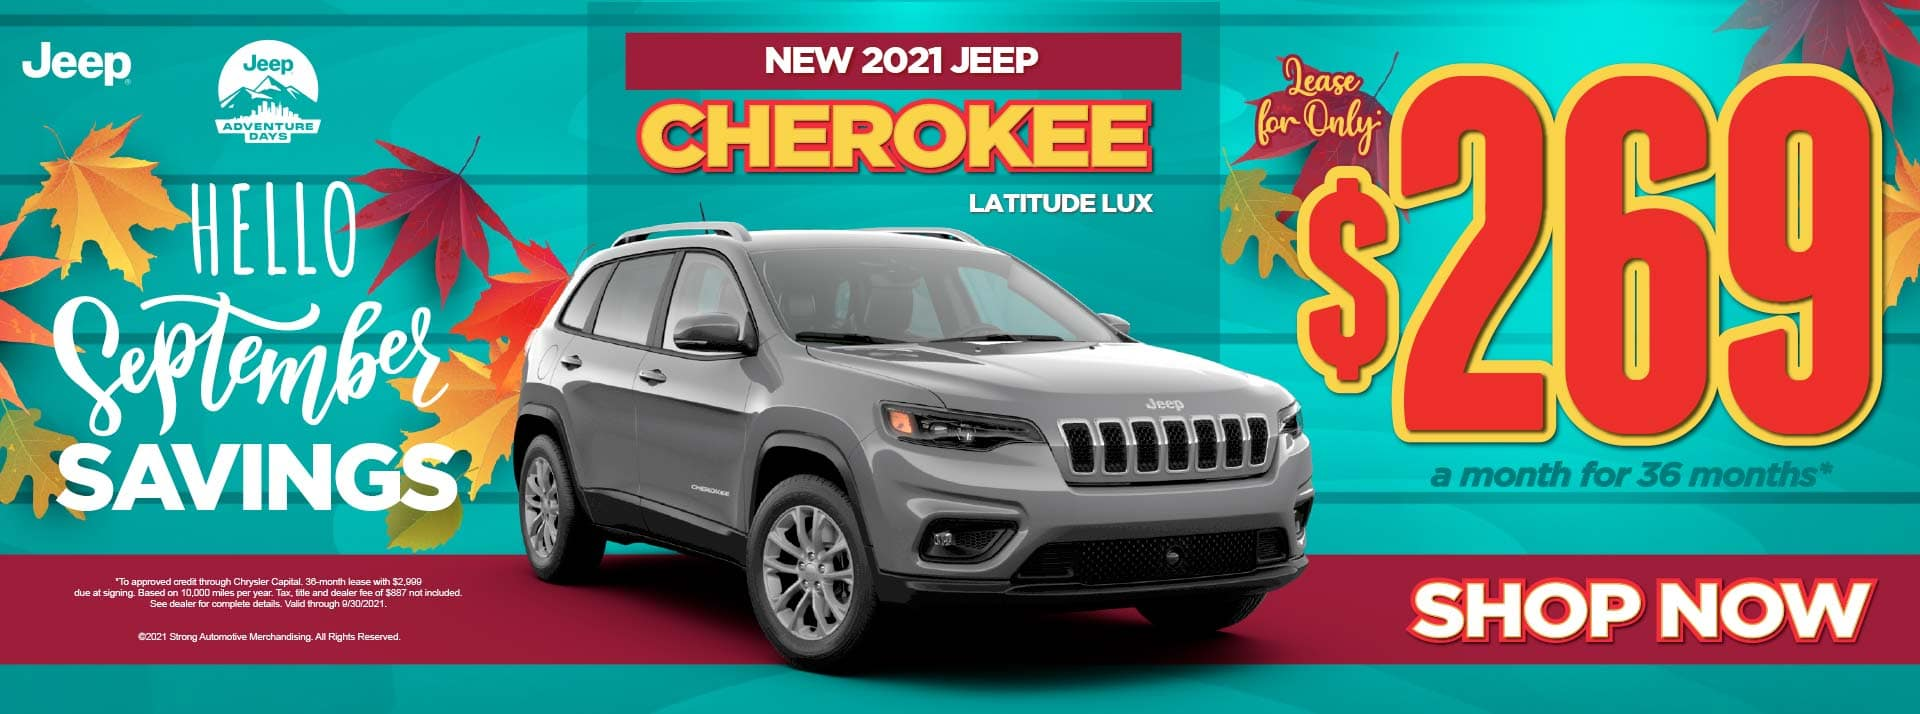 New 2021 Jeep Cherokee Latitude Lux - $269 / mo ACT NOW